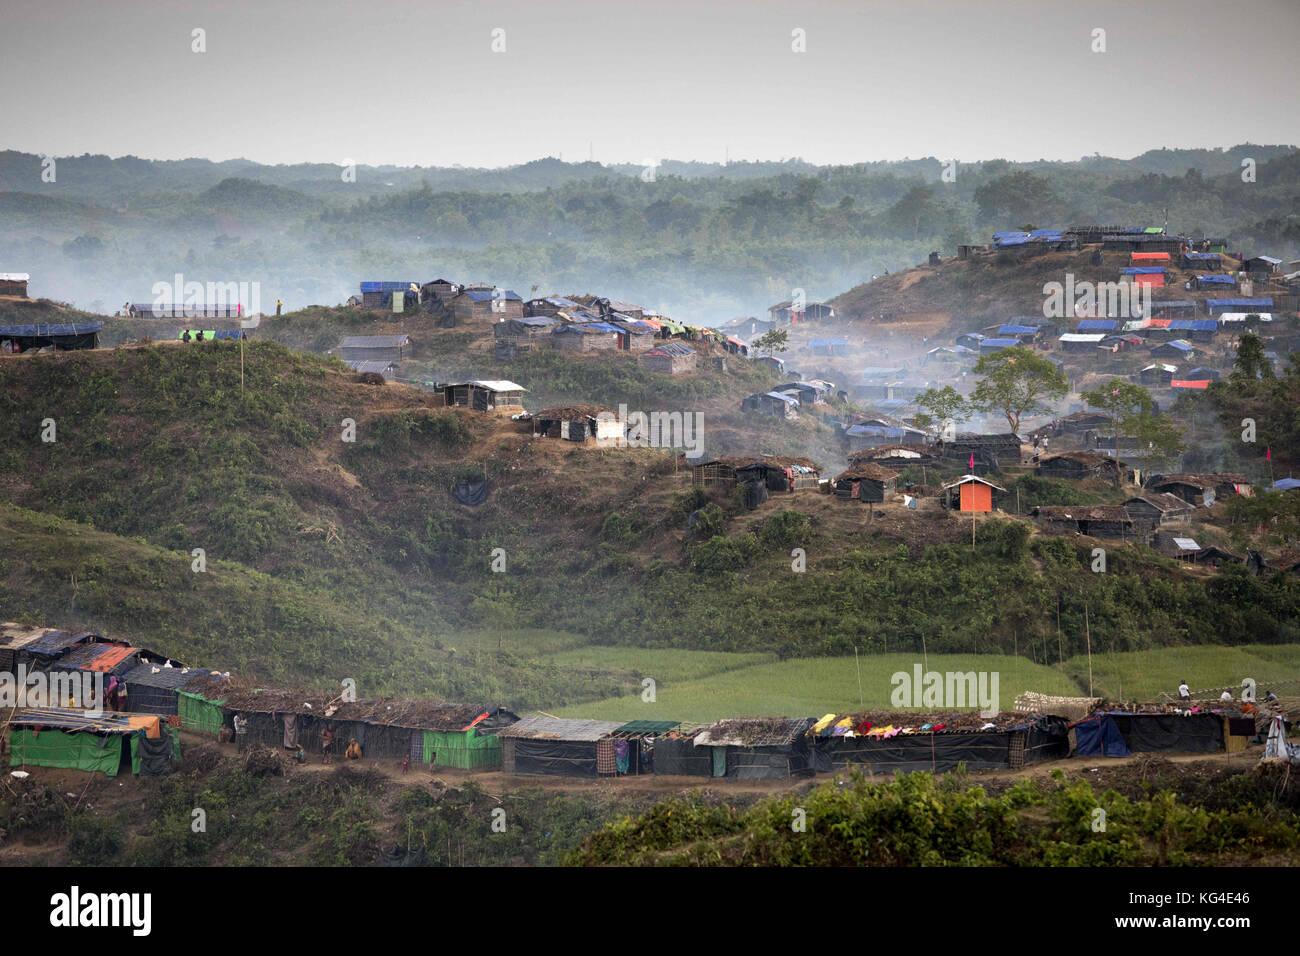 "November 3, 2017 - November 03, 2017 Cox's Bazar, Bangladesh ''"" Thankhali refugee camp in Cox'sbazar, - Stock Image"